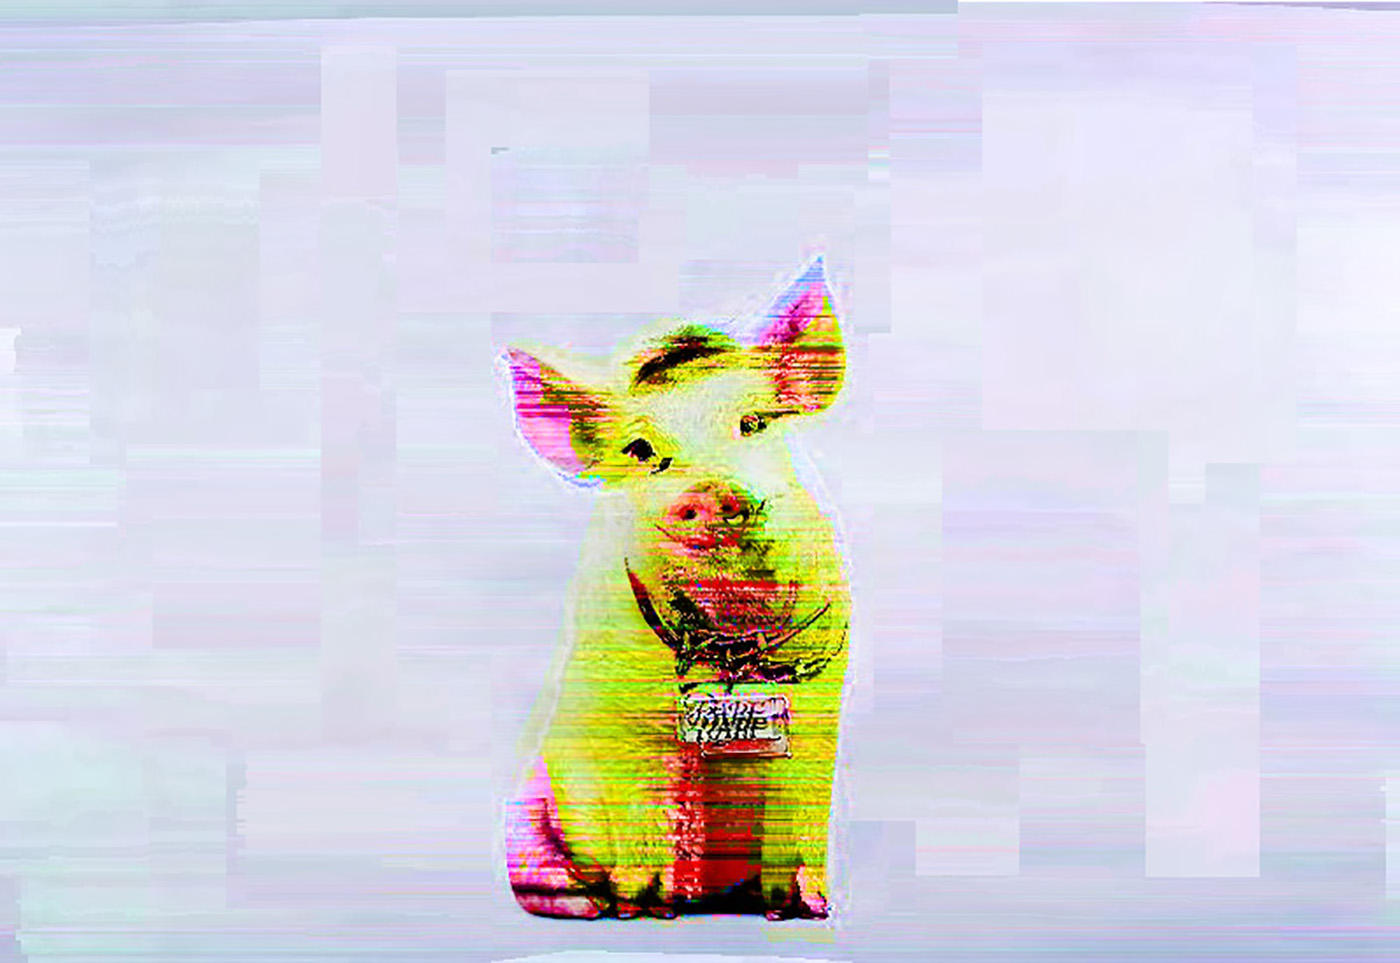 Glitch art pixel 98s 90s year past movie titanic Computer mac windows babe pig vaporwave